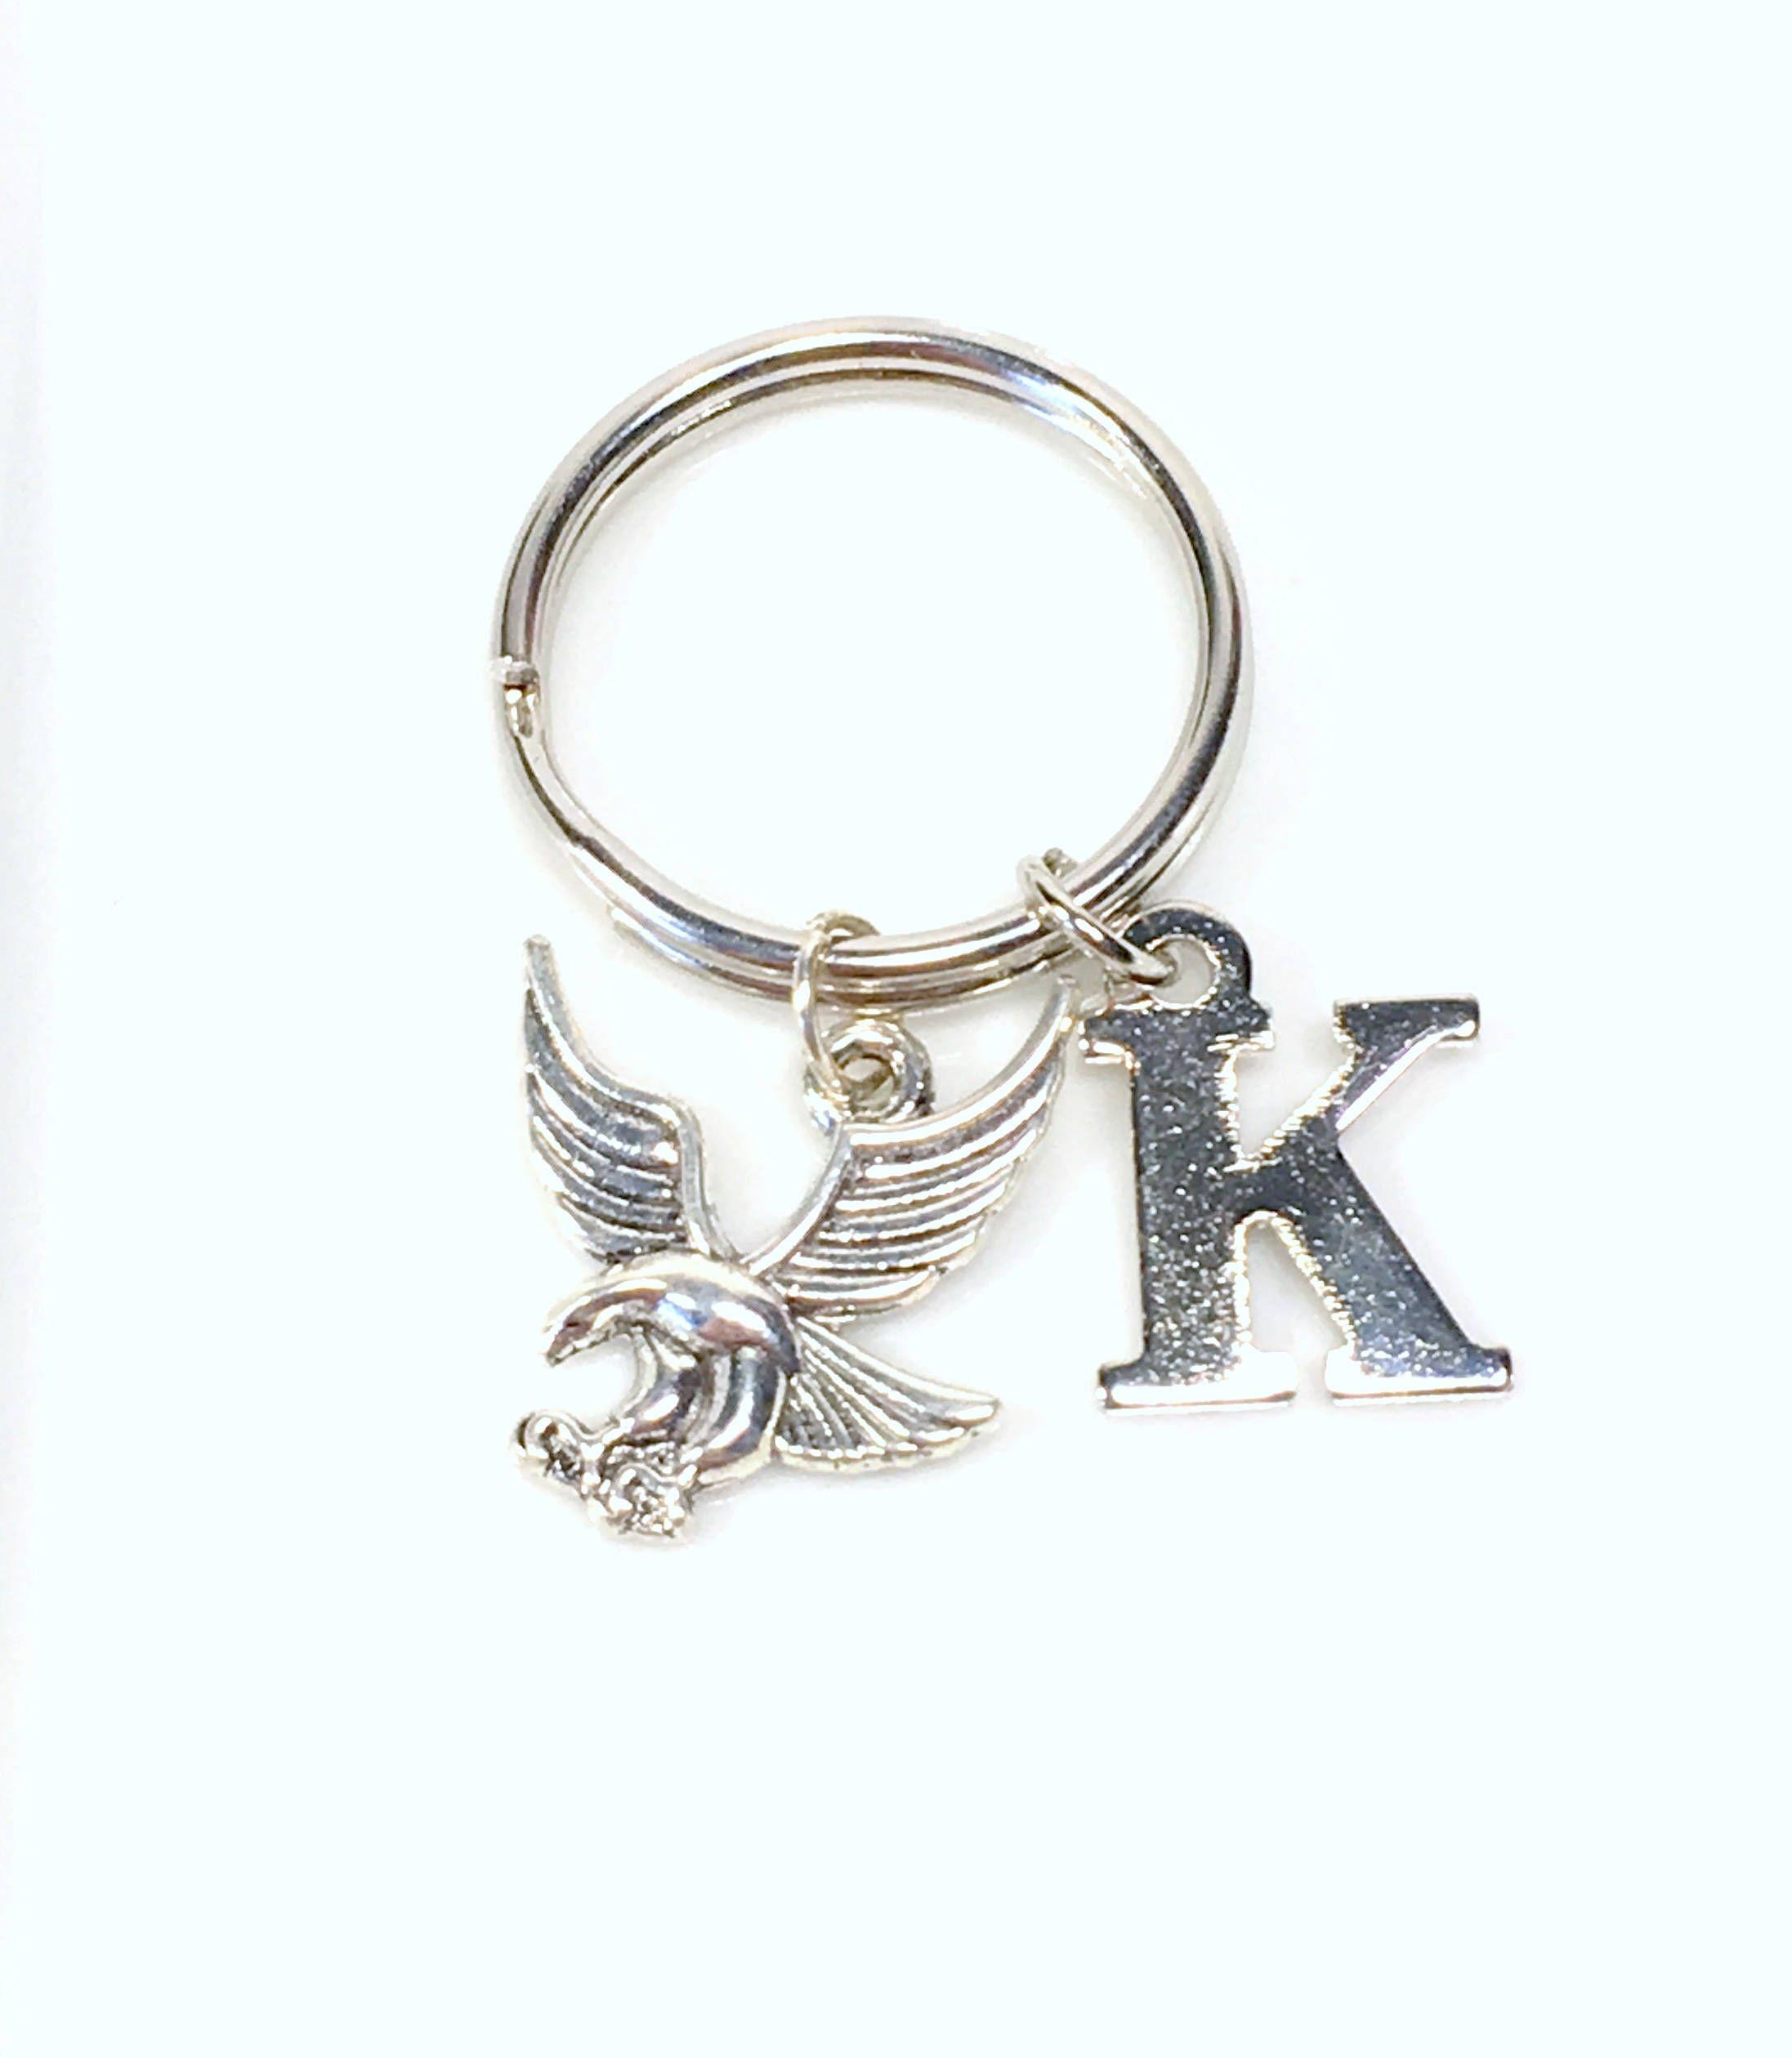 Vintage gull bird Key Rings Fashion Car Keychain Silver Color Metal Key Chains Accessory